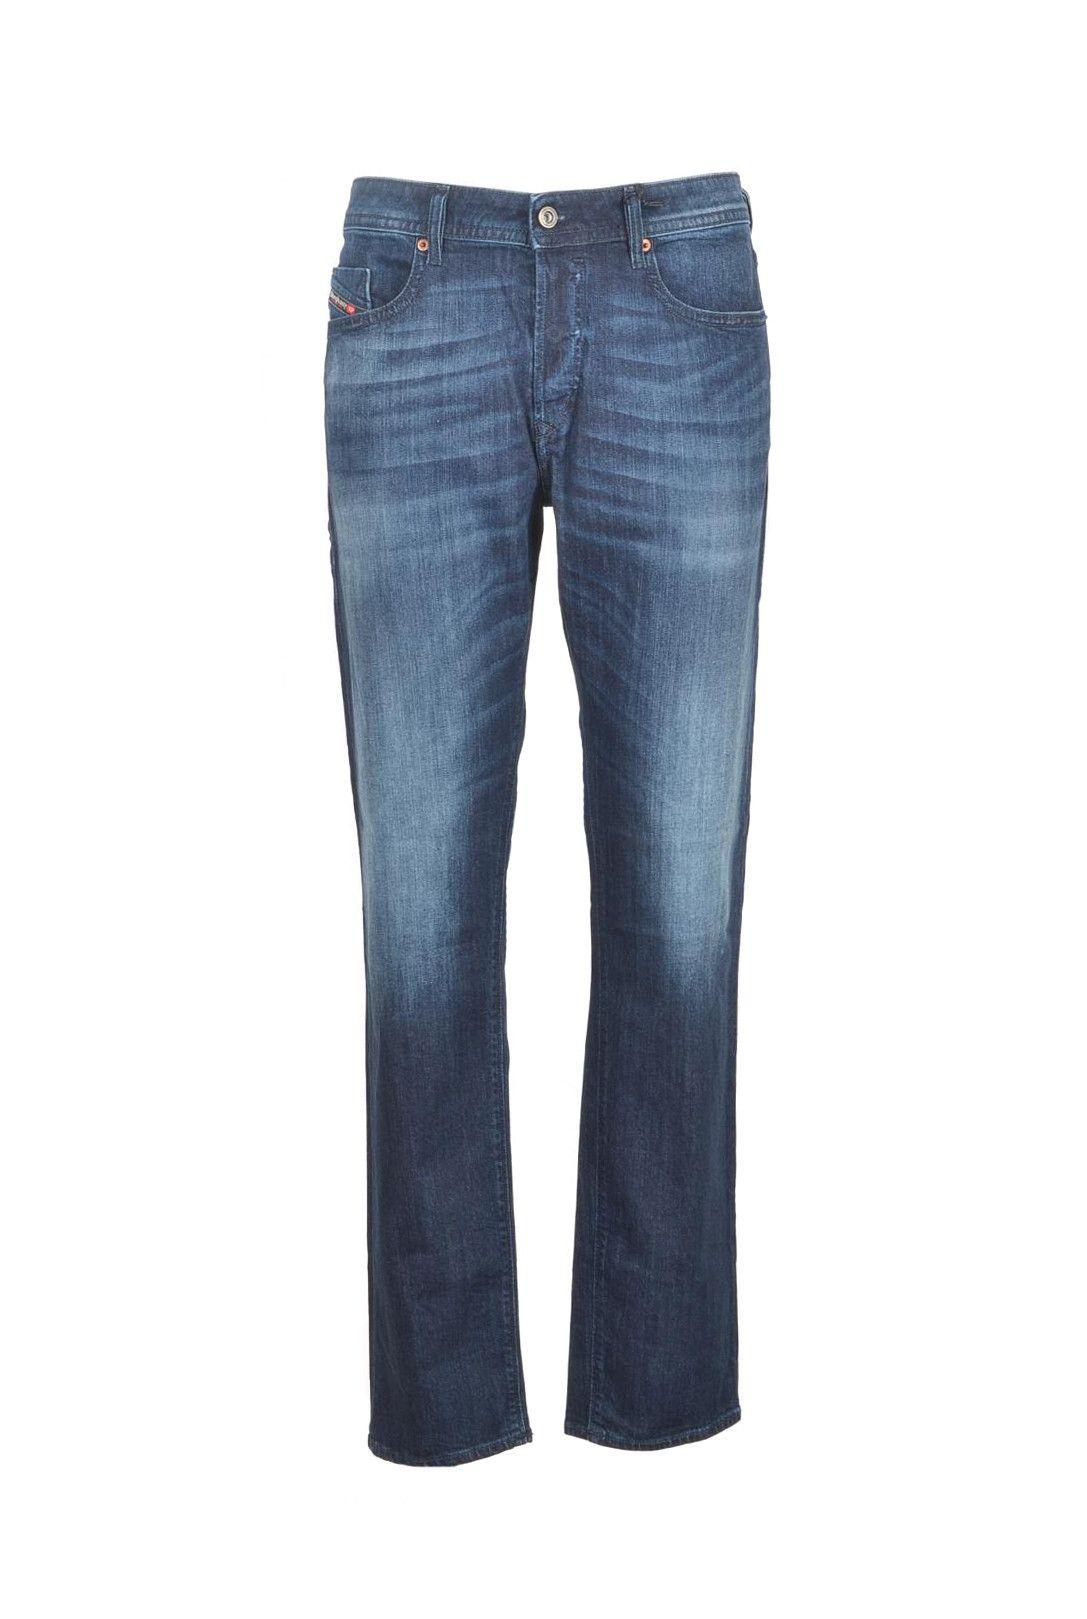 Diesel Men's Jeans In Blue